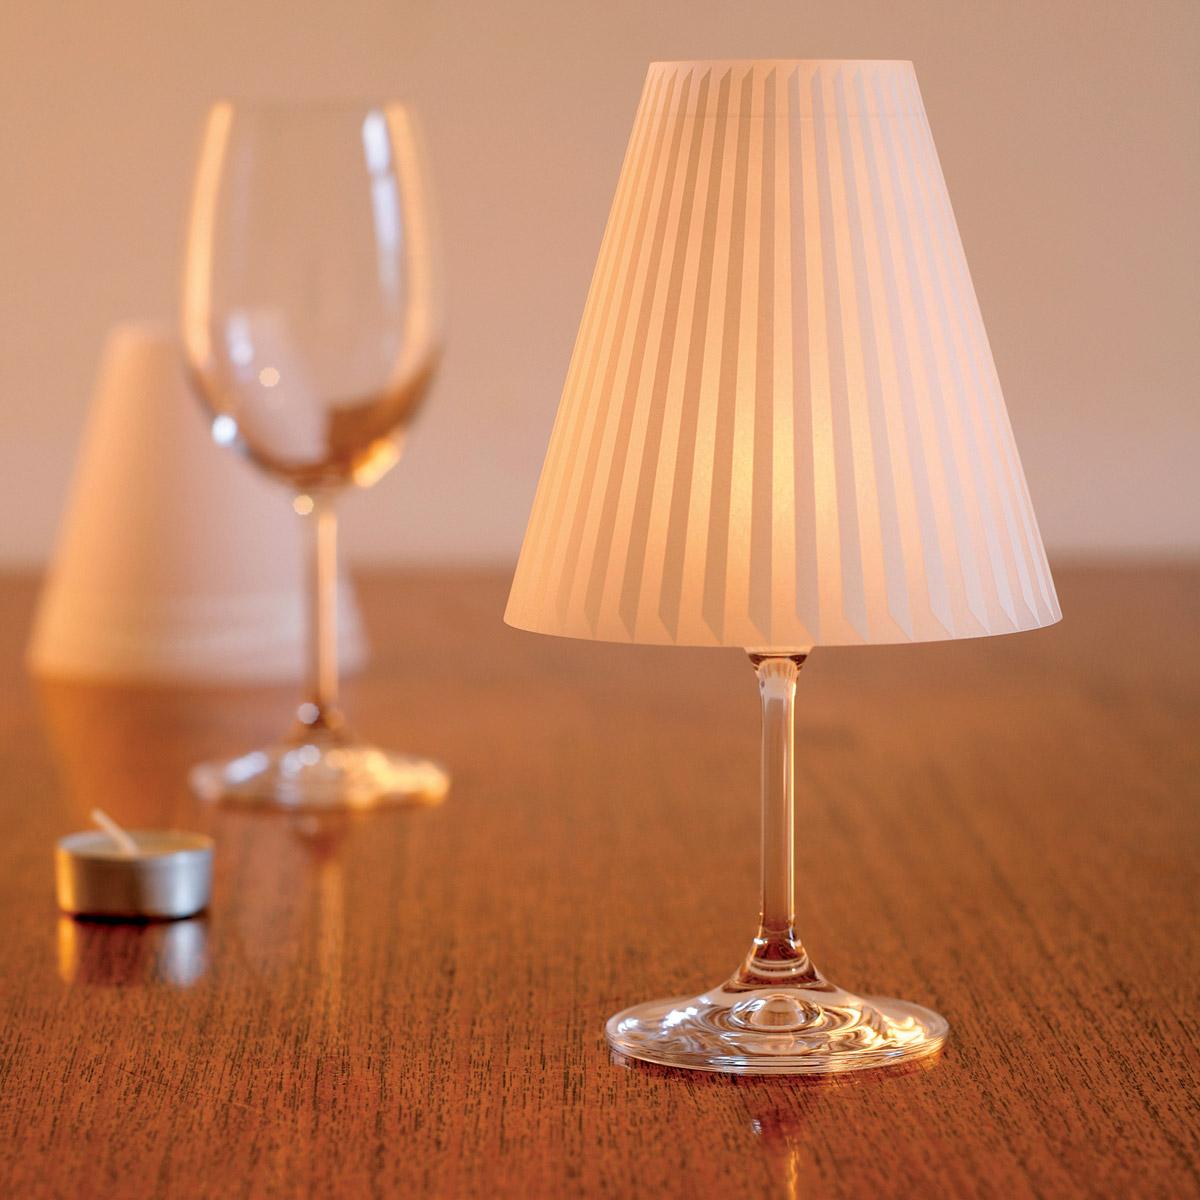 neu dekoop sch ne helene 3er set weinglas lampenschirme. Black Bedroom Furniture Sets. Home Design Ideas